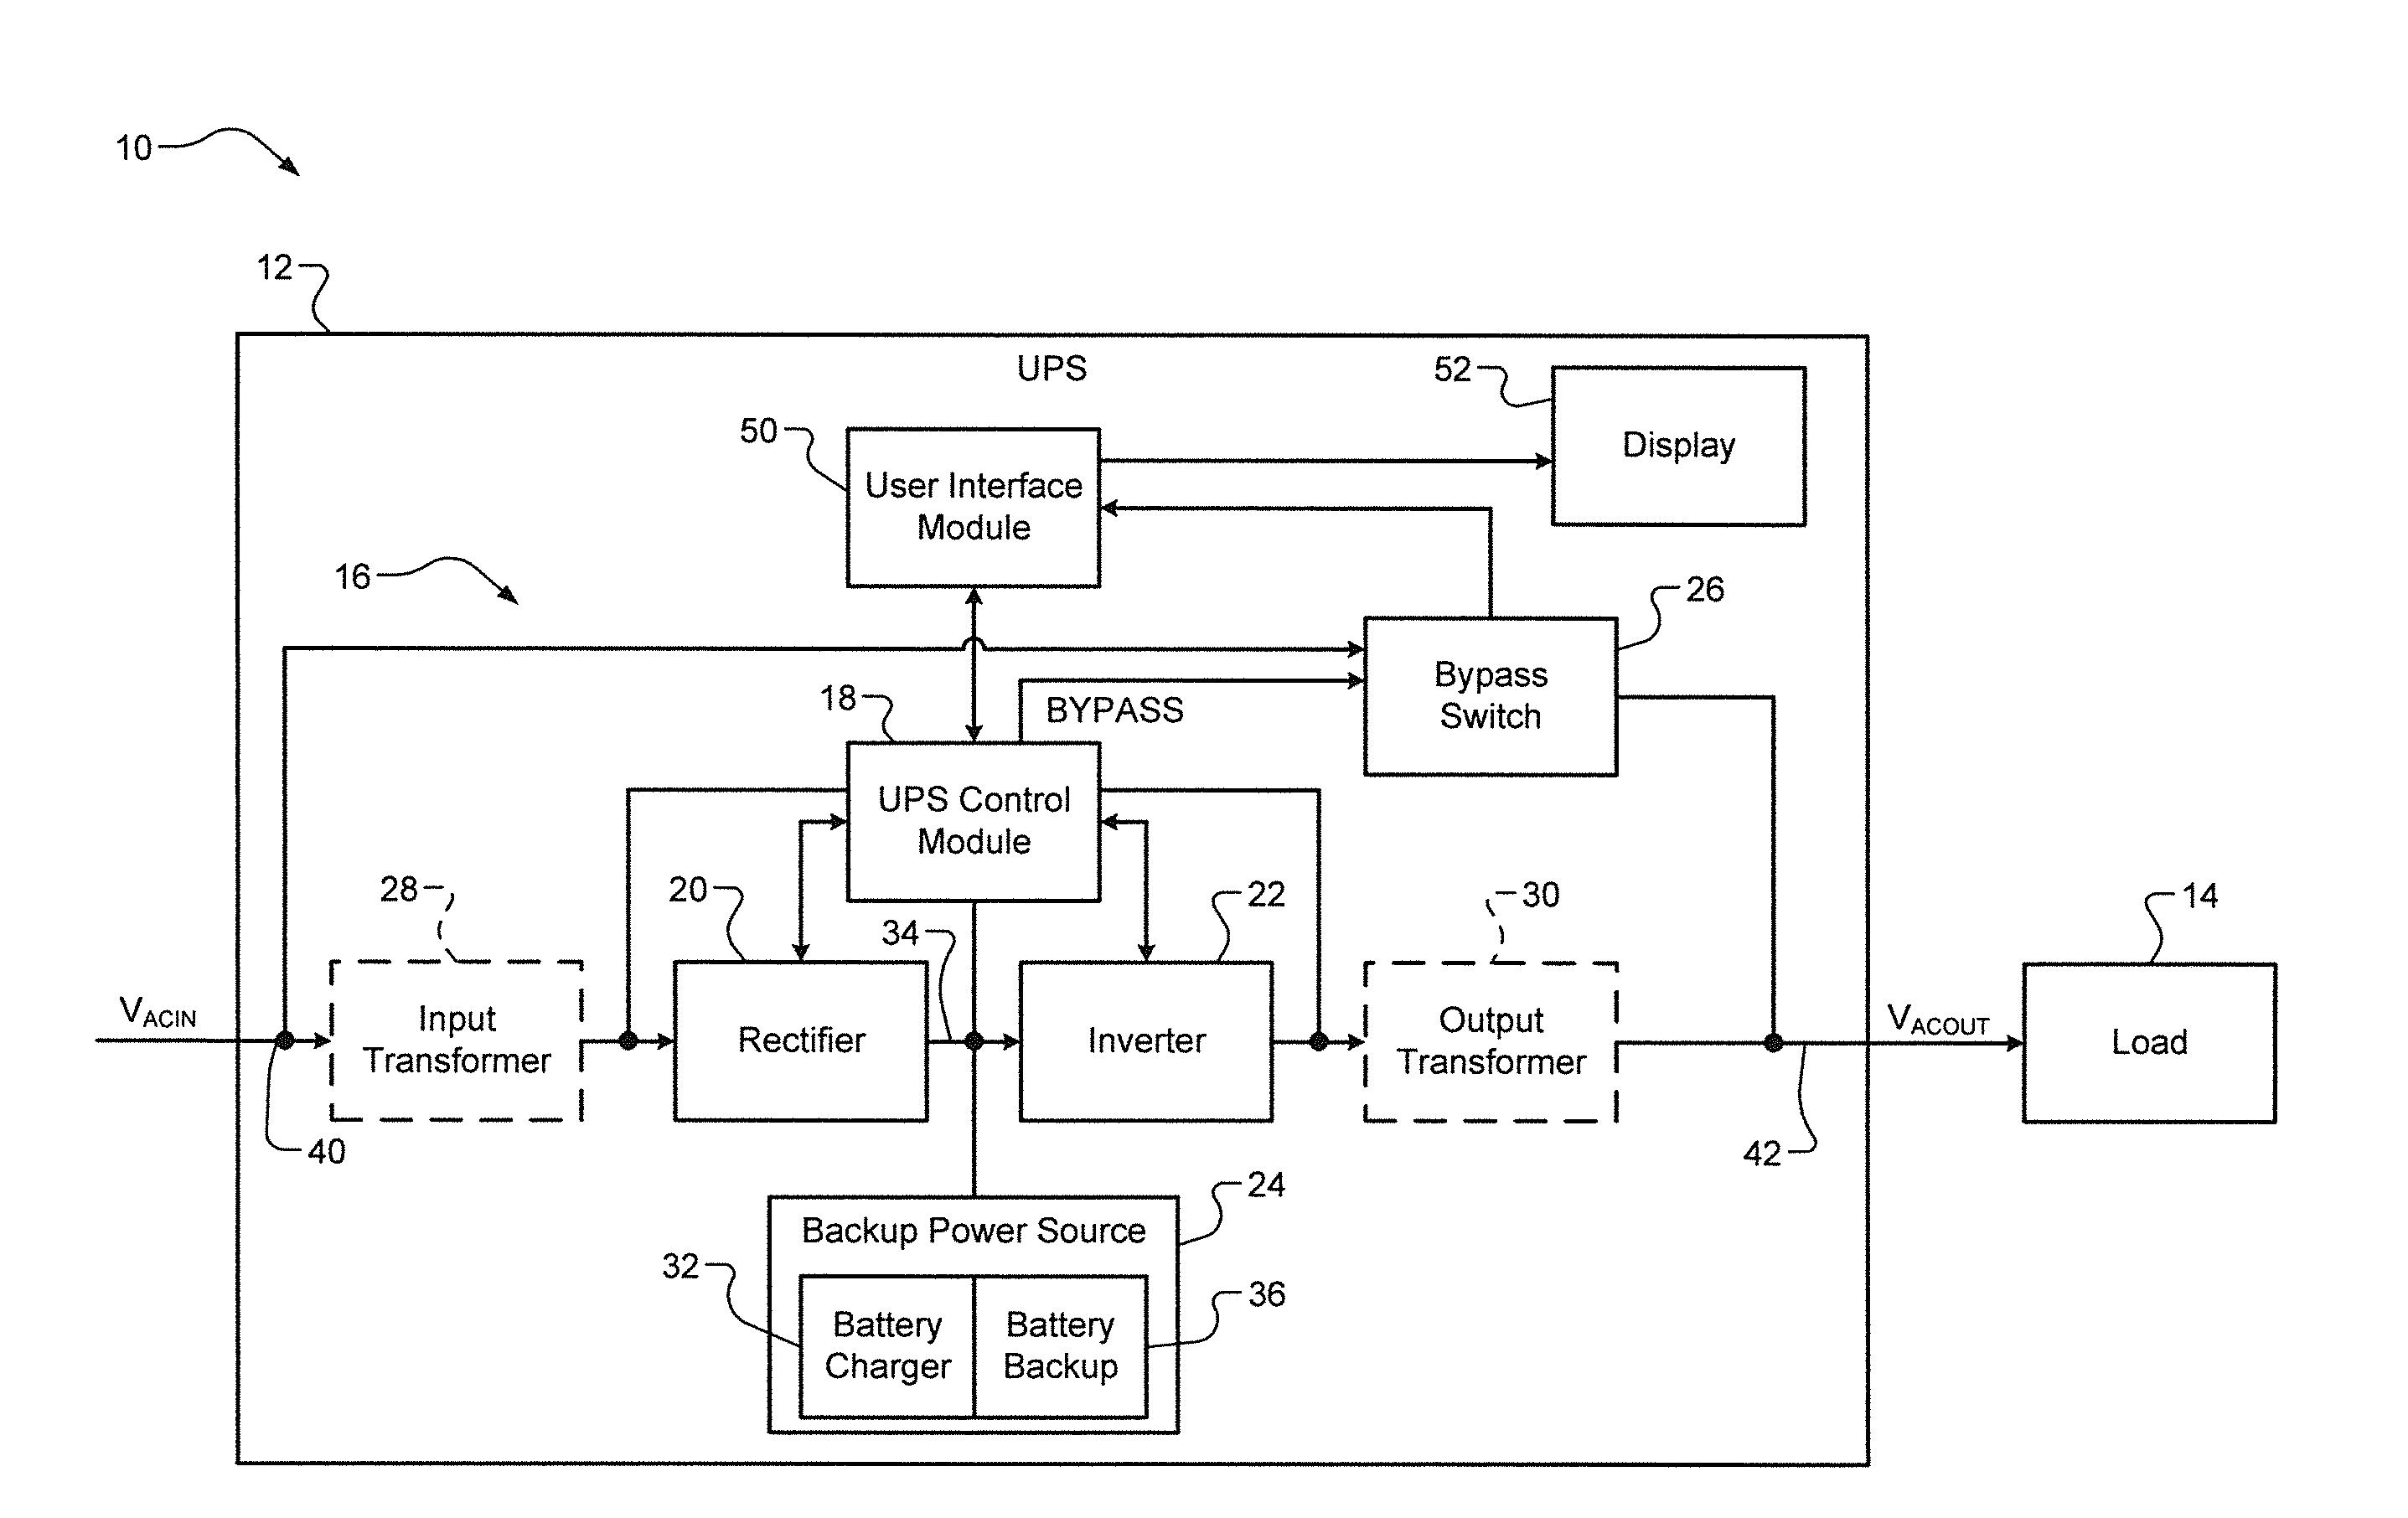 Ups Maintenance Bypass Switch Wiring Diagram from lh3.googleusercontent.com